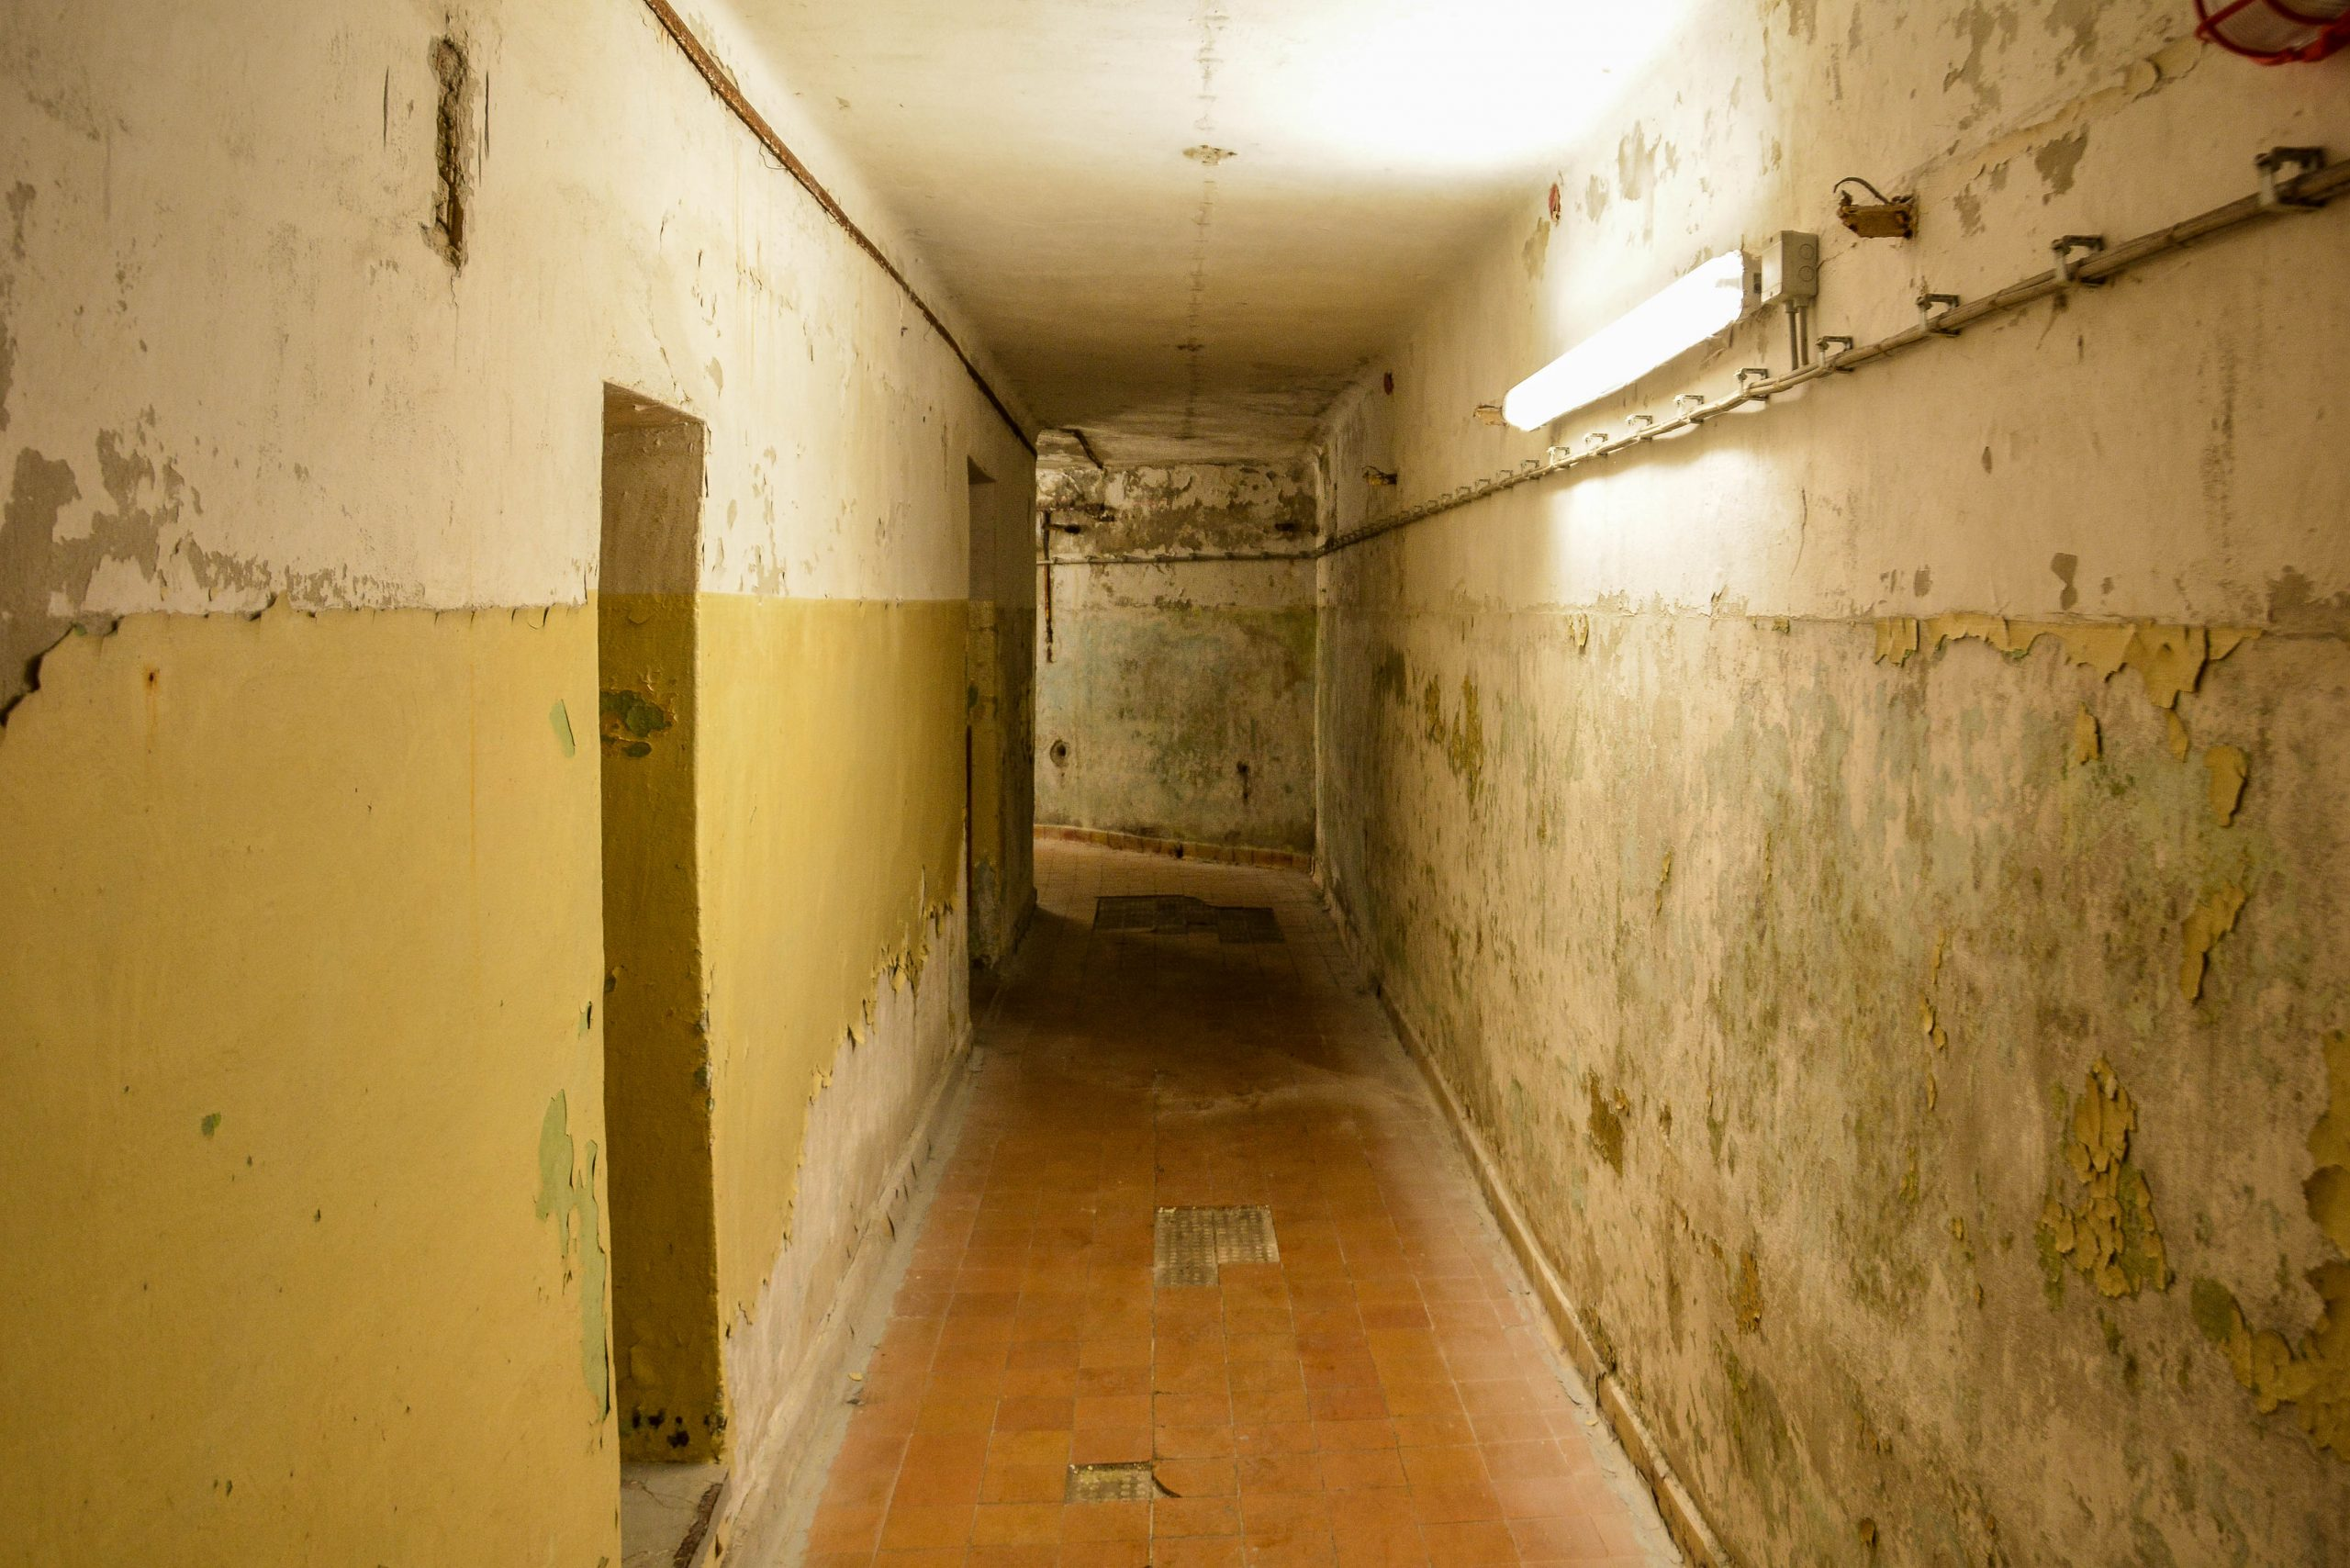 bunker flur hallway bunker zeppelin amt 500 maybach bunker ranet wehrmacht sowjet soviet military zossen brandenburg germany lost palces urbex abandoned